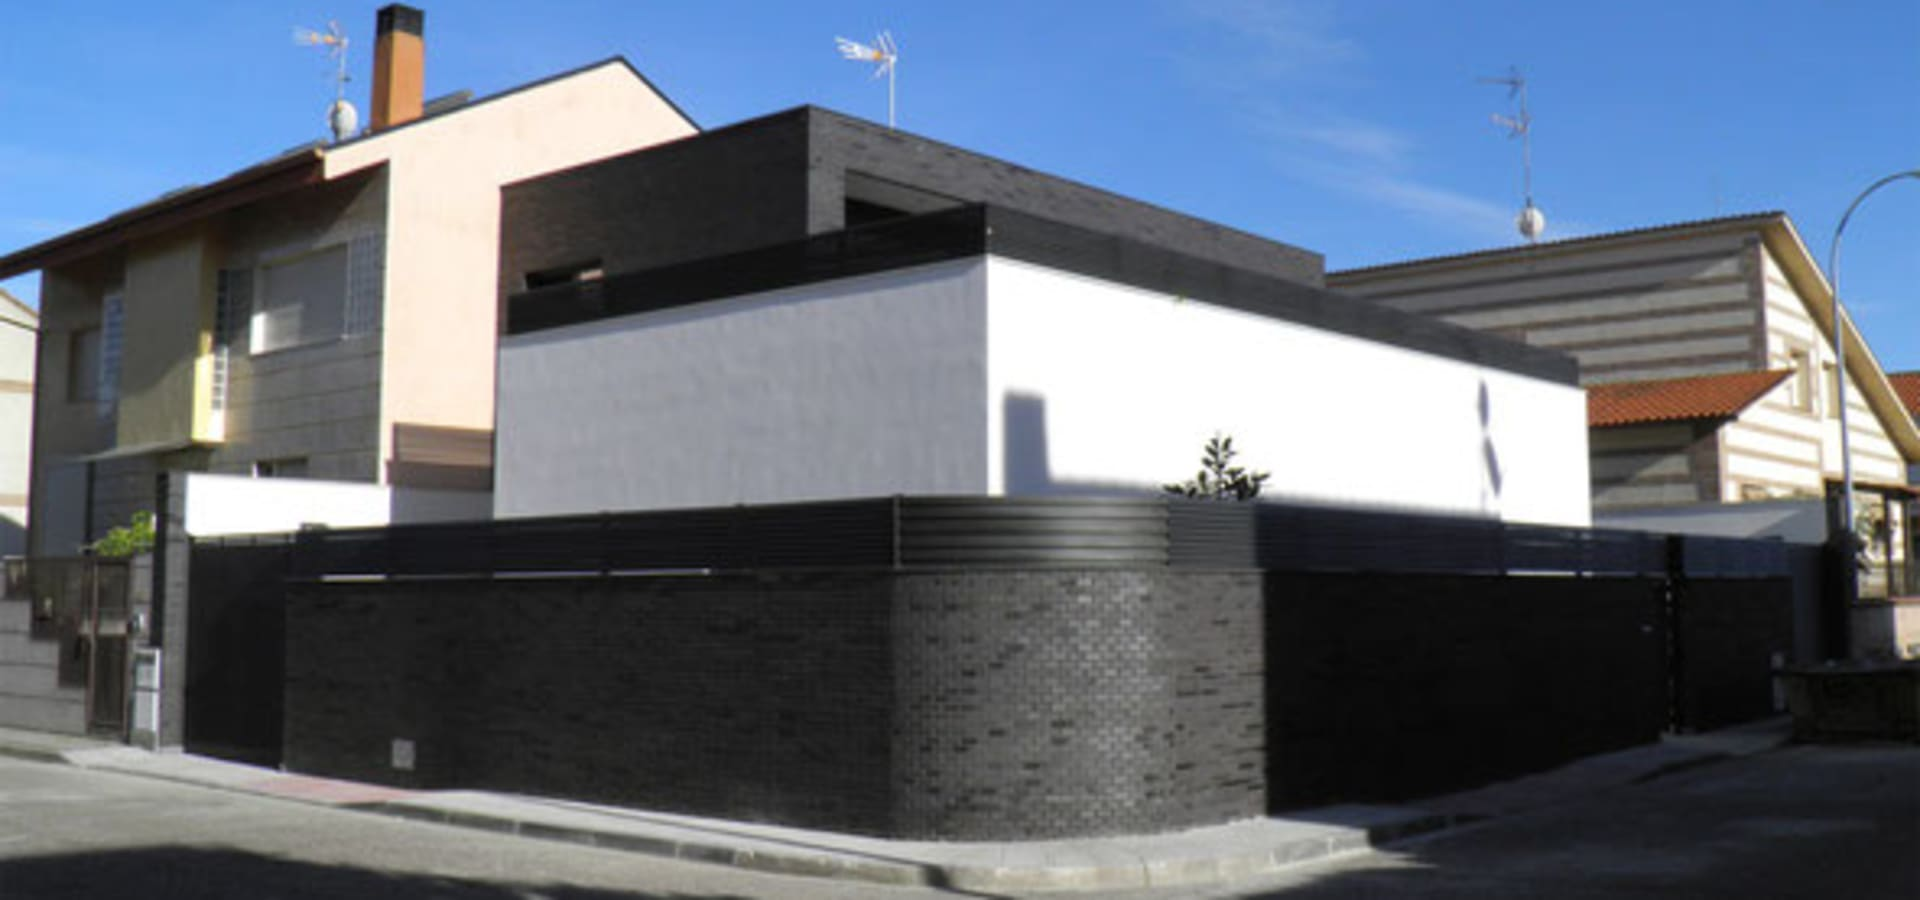 Vivienda unifamiliar toledo by rodrigo p rez estudio de - Estudio arquitectura toledo ...